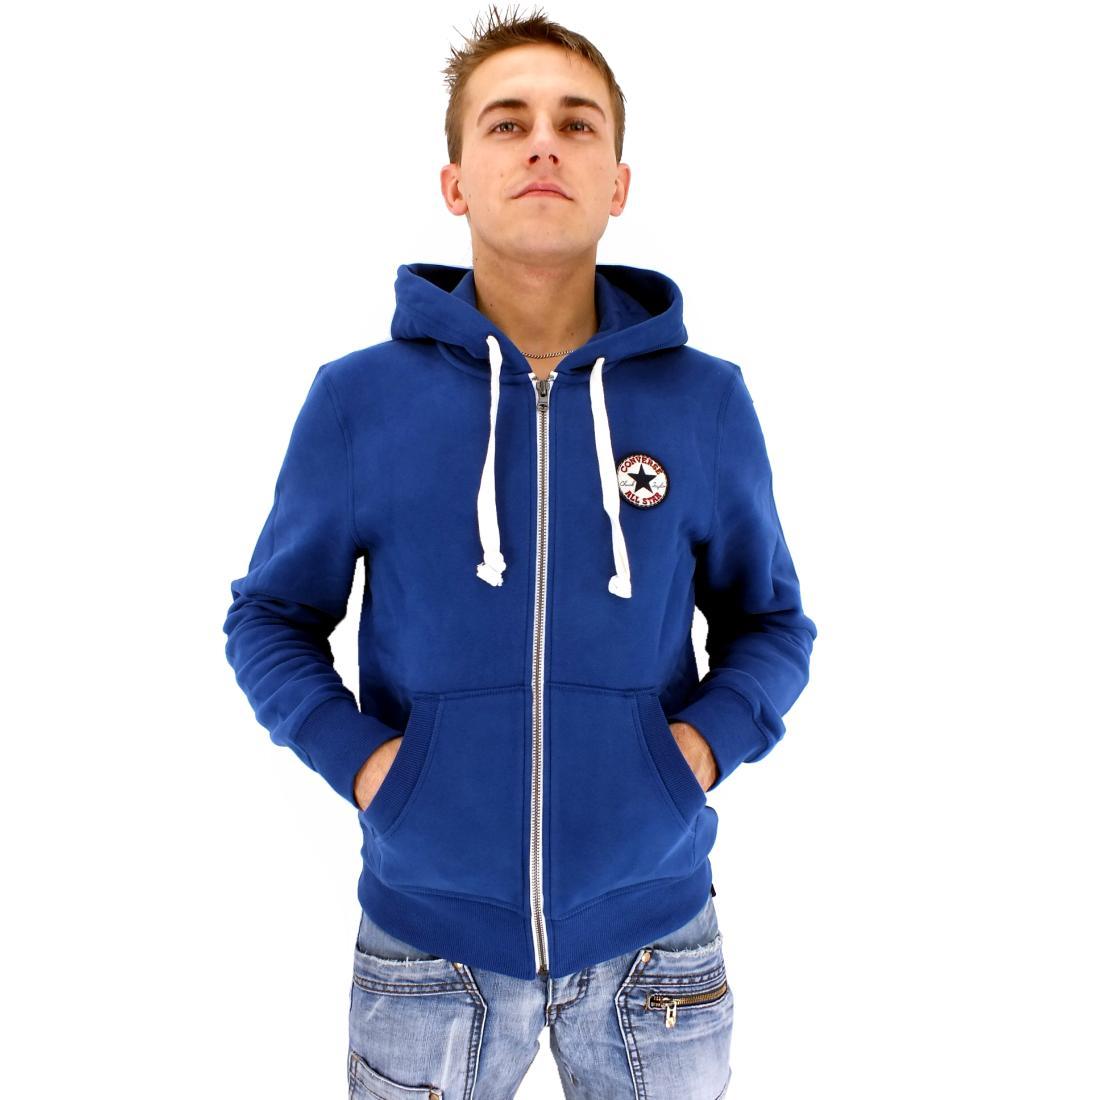 converse of core c patch fz hoodie jacke kapuzenjacke herren grau schwarz blau ebay